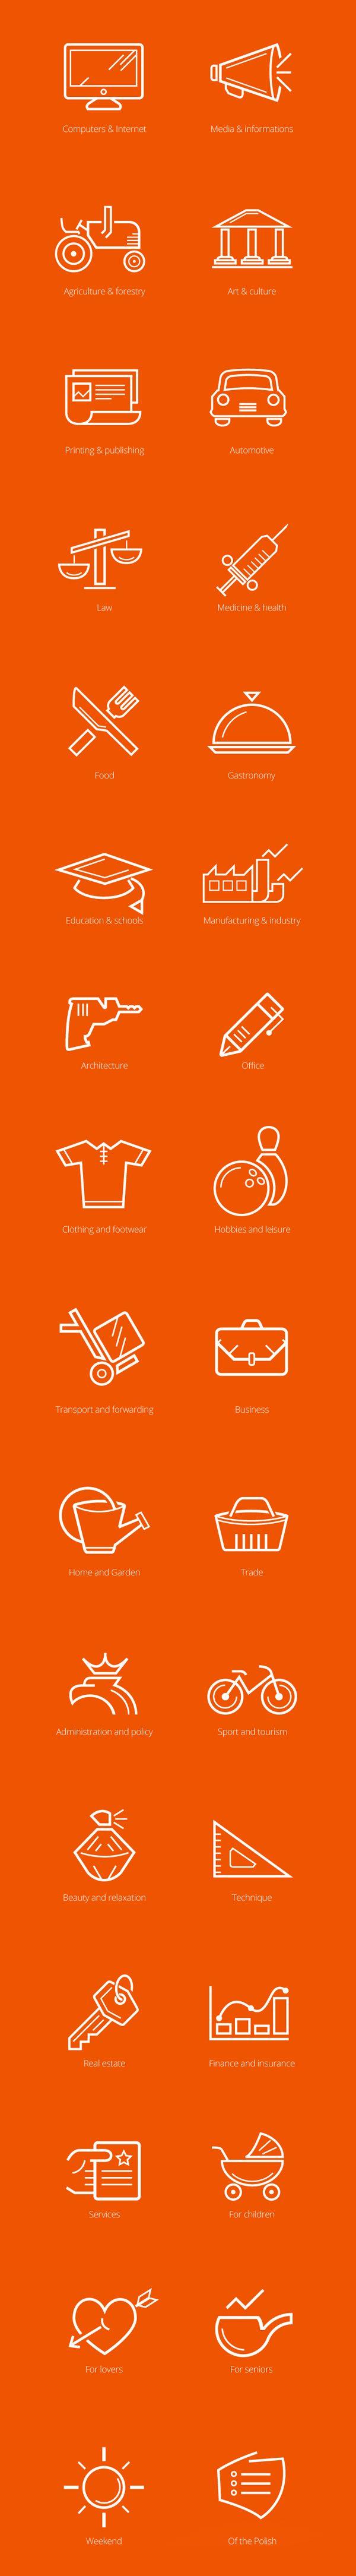 Wireless icon line iconset iconsmind - Firmy Net Icons Icons Line Icondesign Iconset App